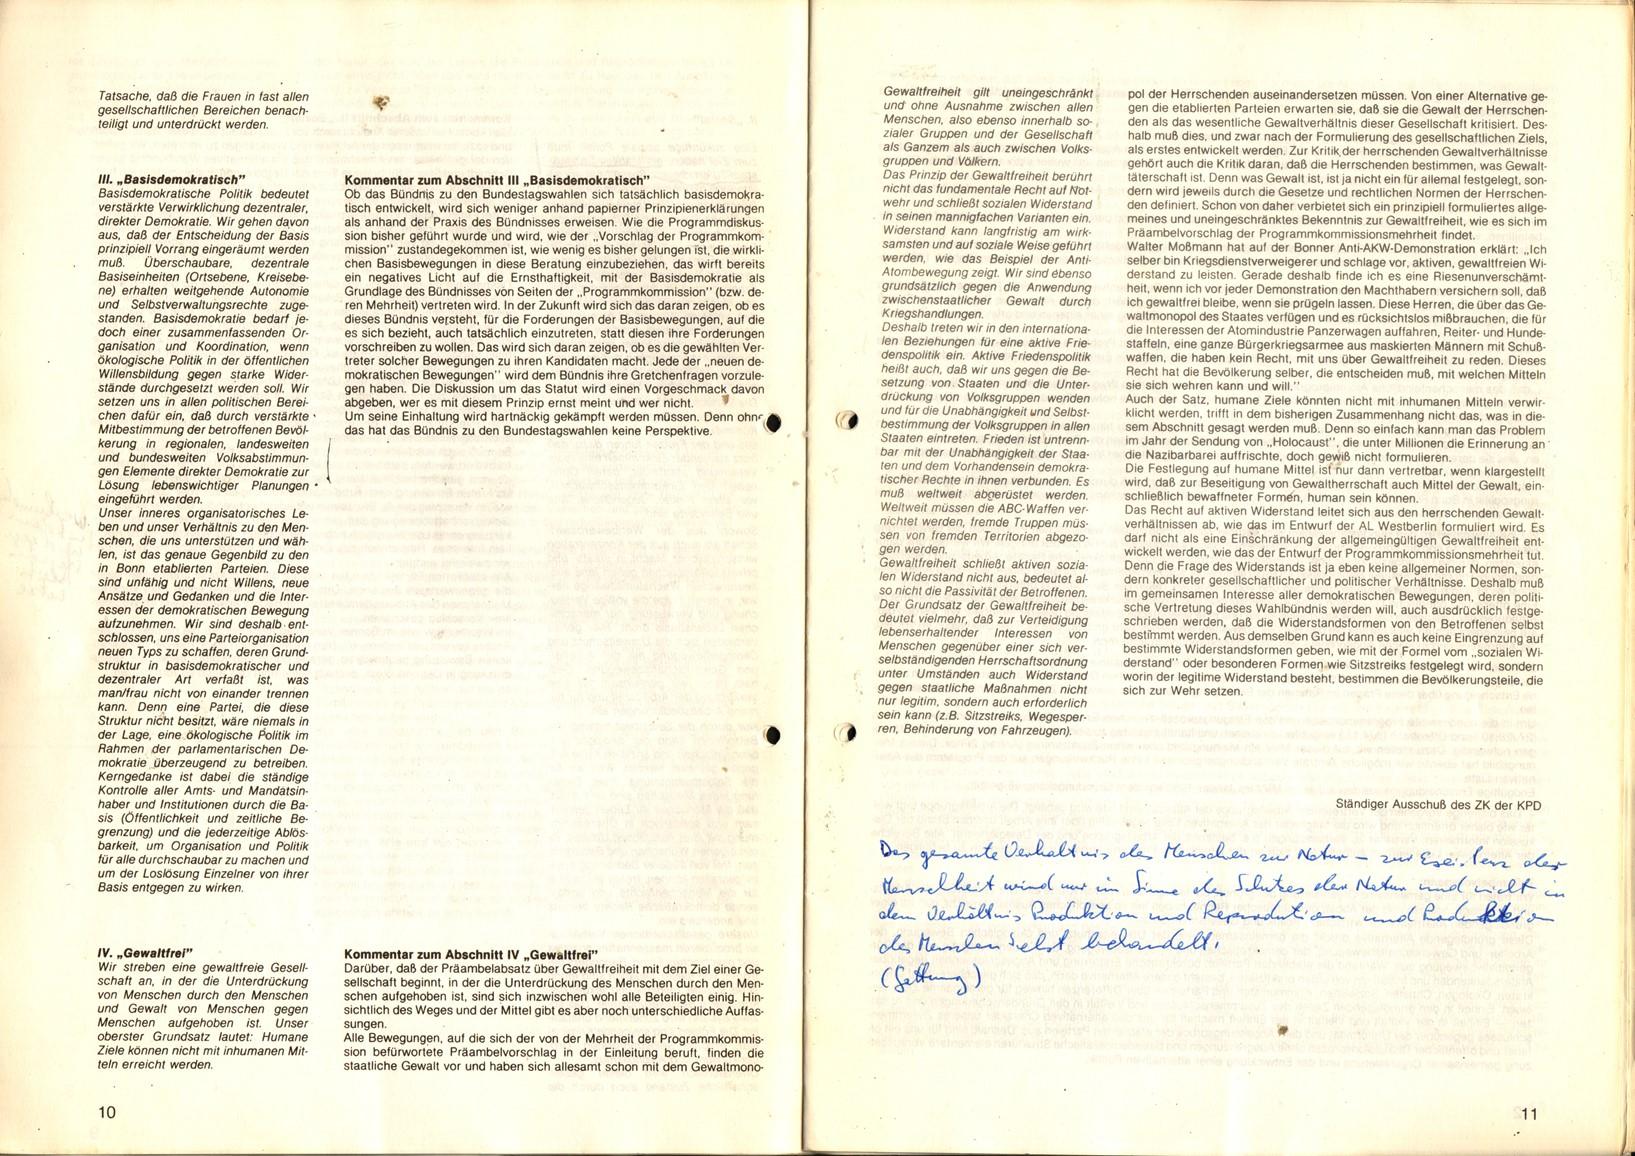 KPDAO_1979_Diskussion_Bundestagswahlen_1980_06